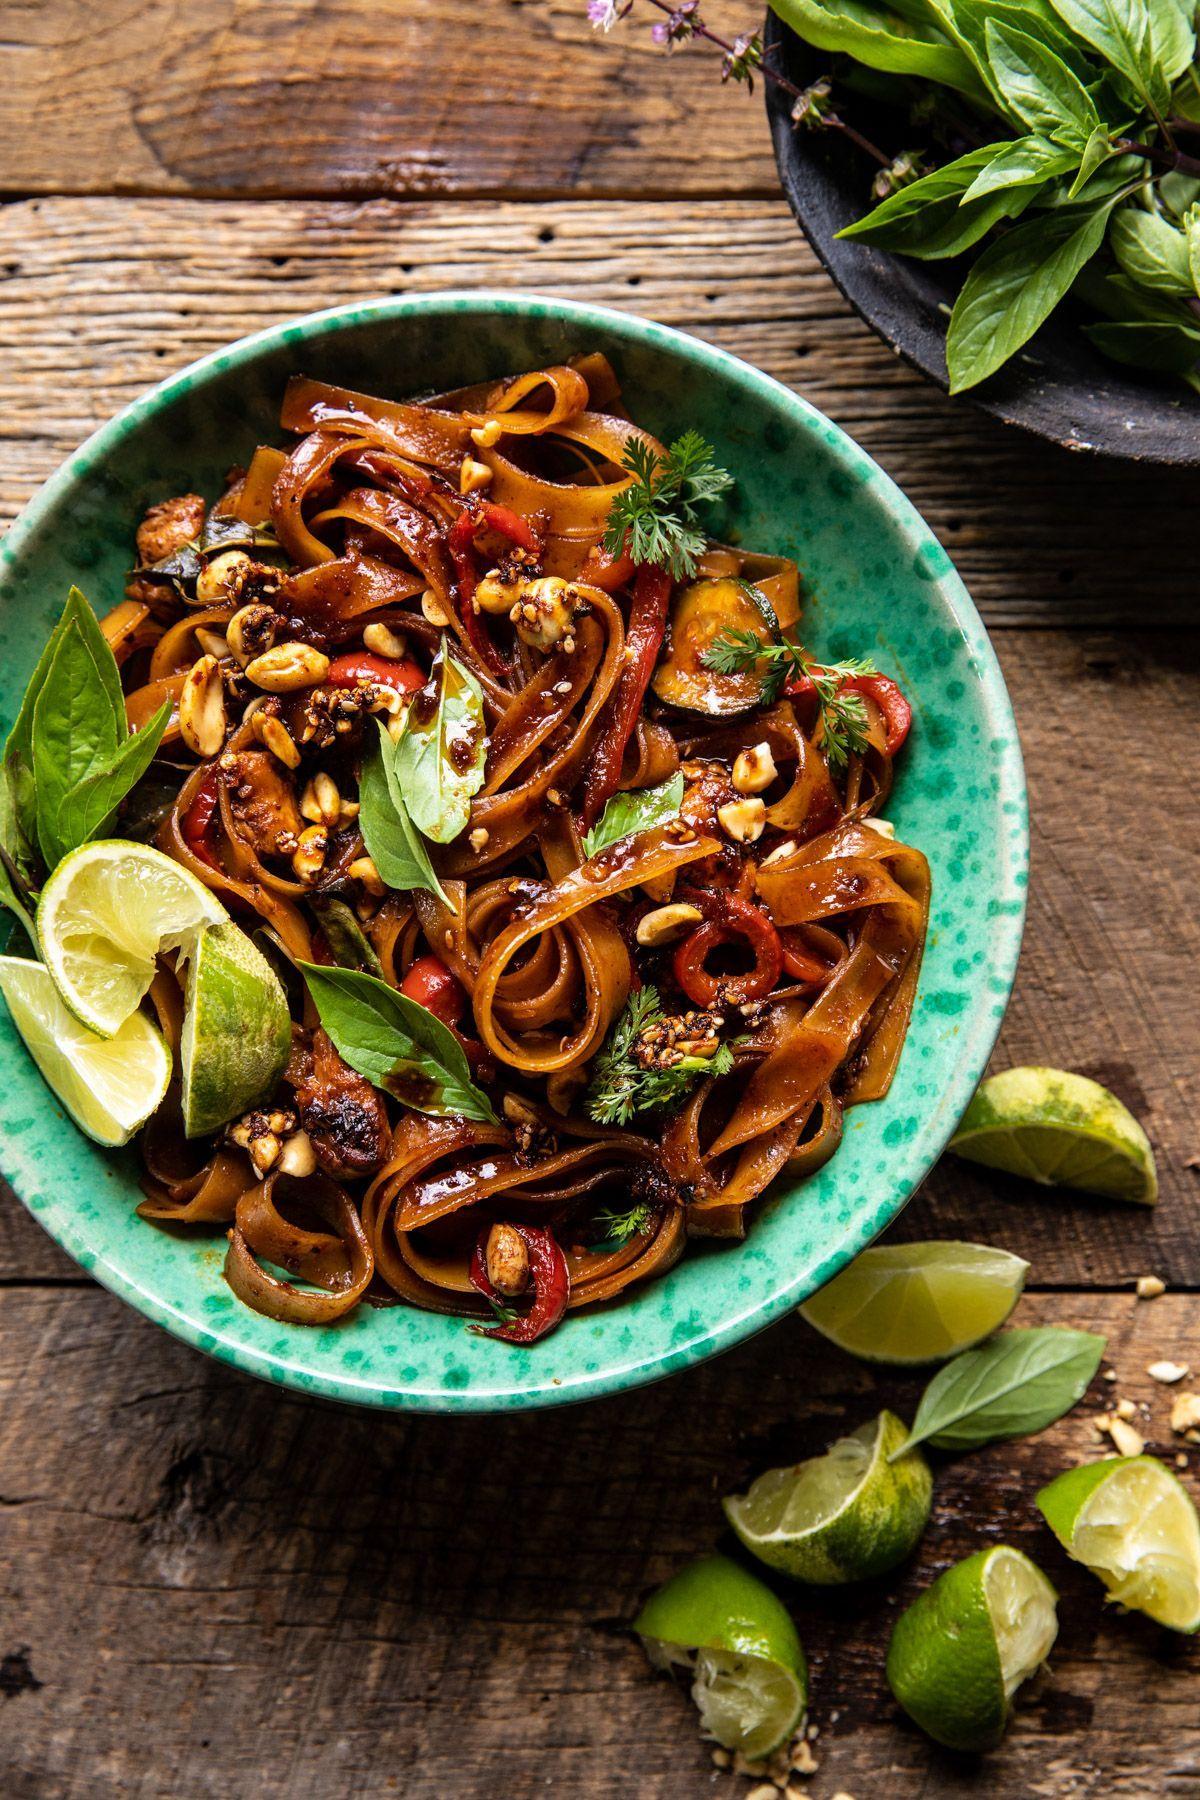 Saucy Thai Summer Noodle Stir Fry With Sesame Peanuts Half Baked Harvest Recipe Half Baked Harvest Recipes Harvest Recipes Recipes